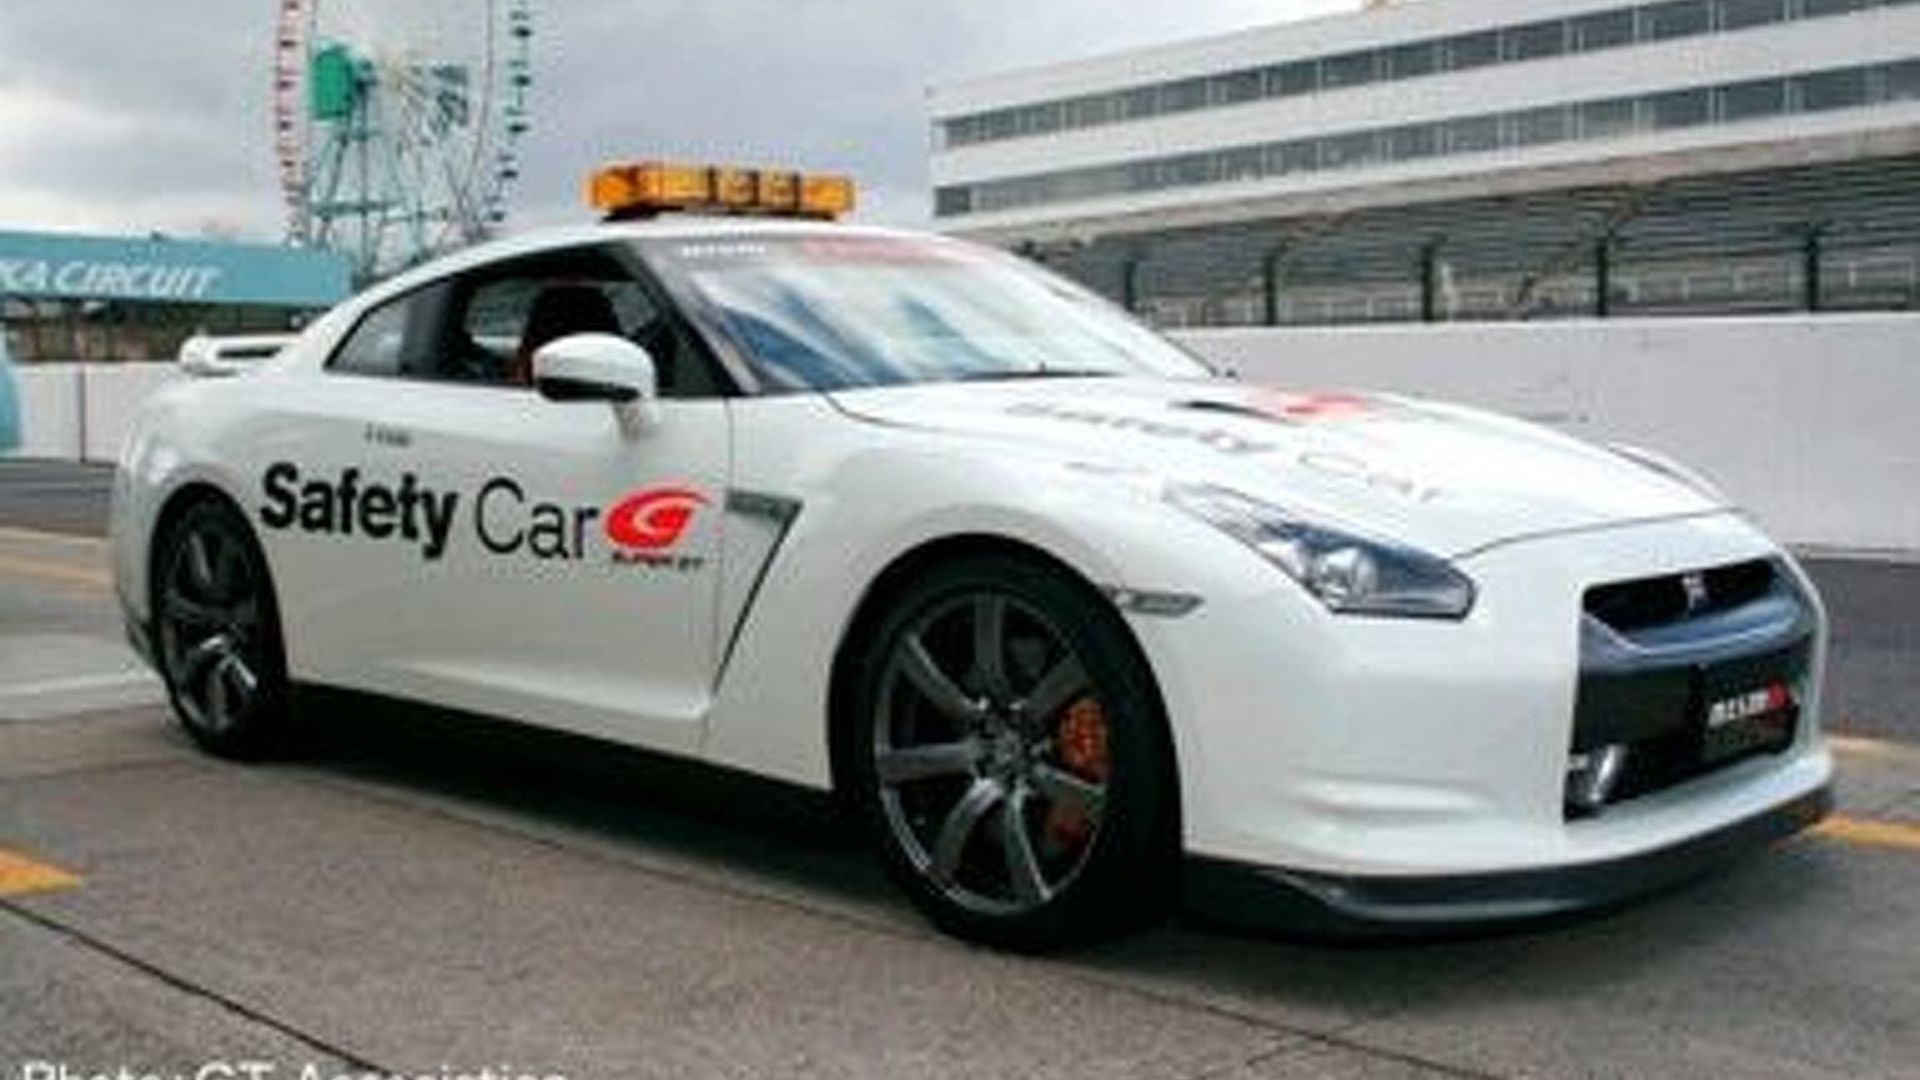 Nissan GT-R Is Official Super GT Pace Car